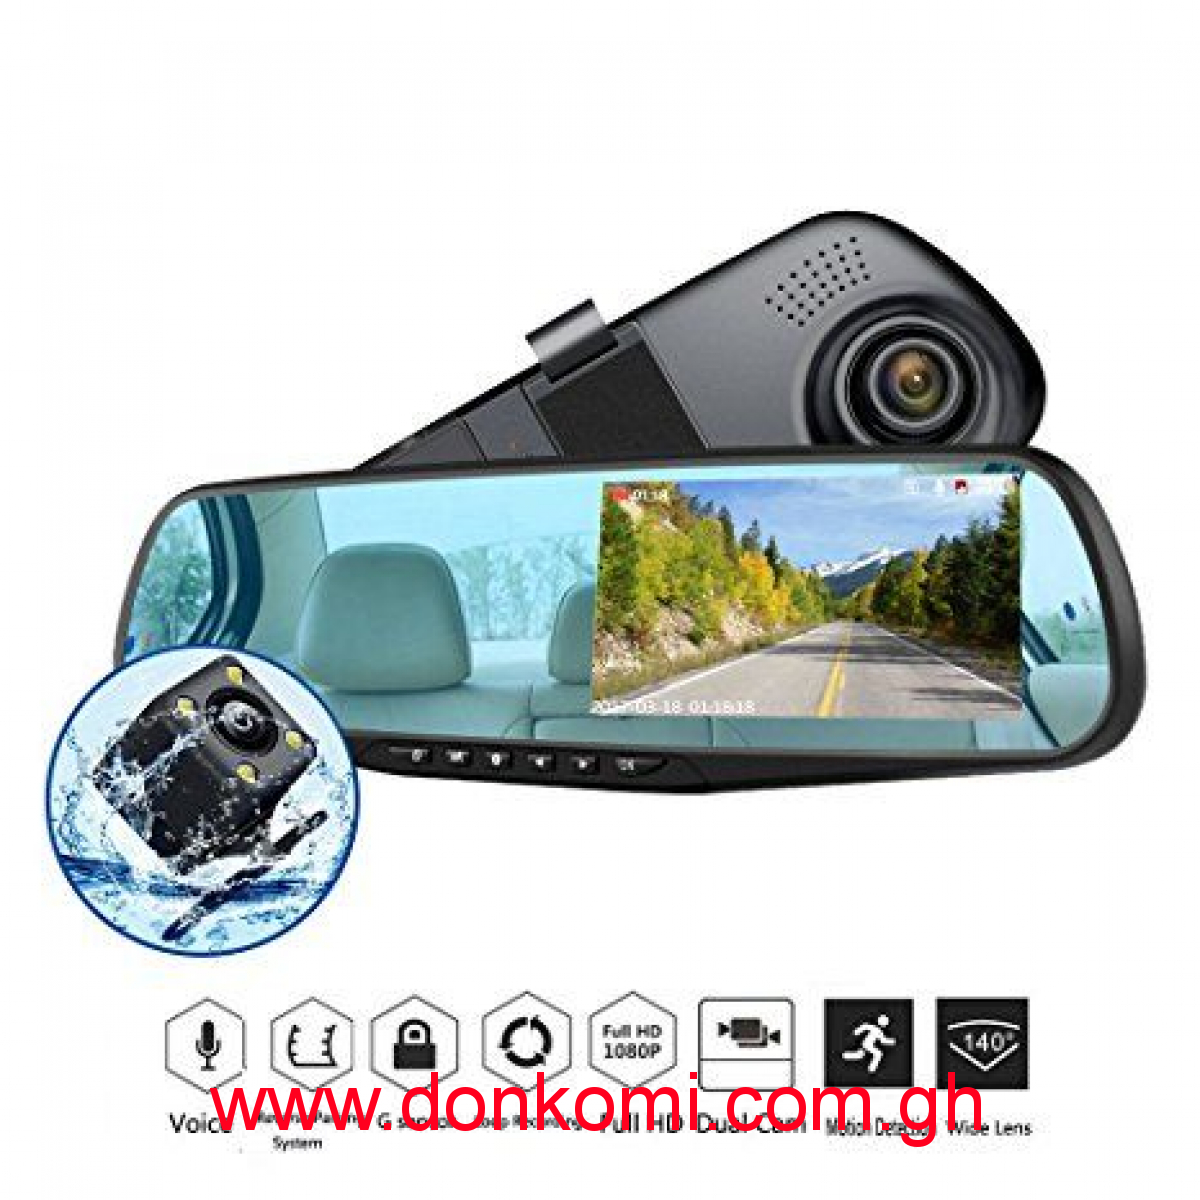 DUAL LENS CAR VIDEO CAMERA 1080P